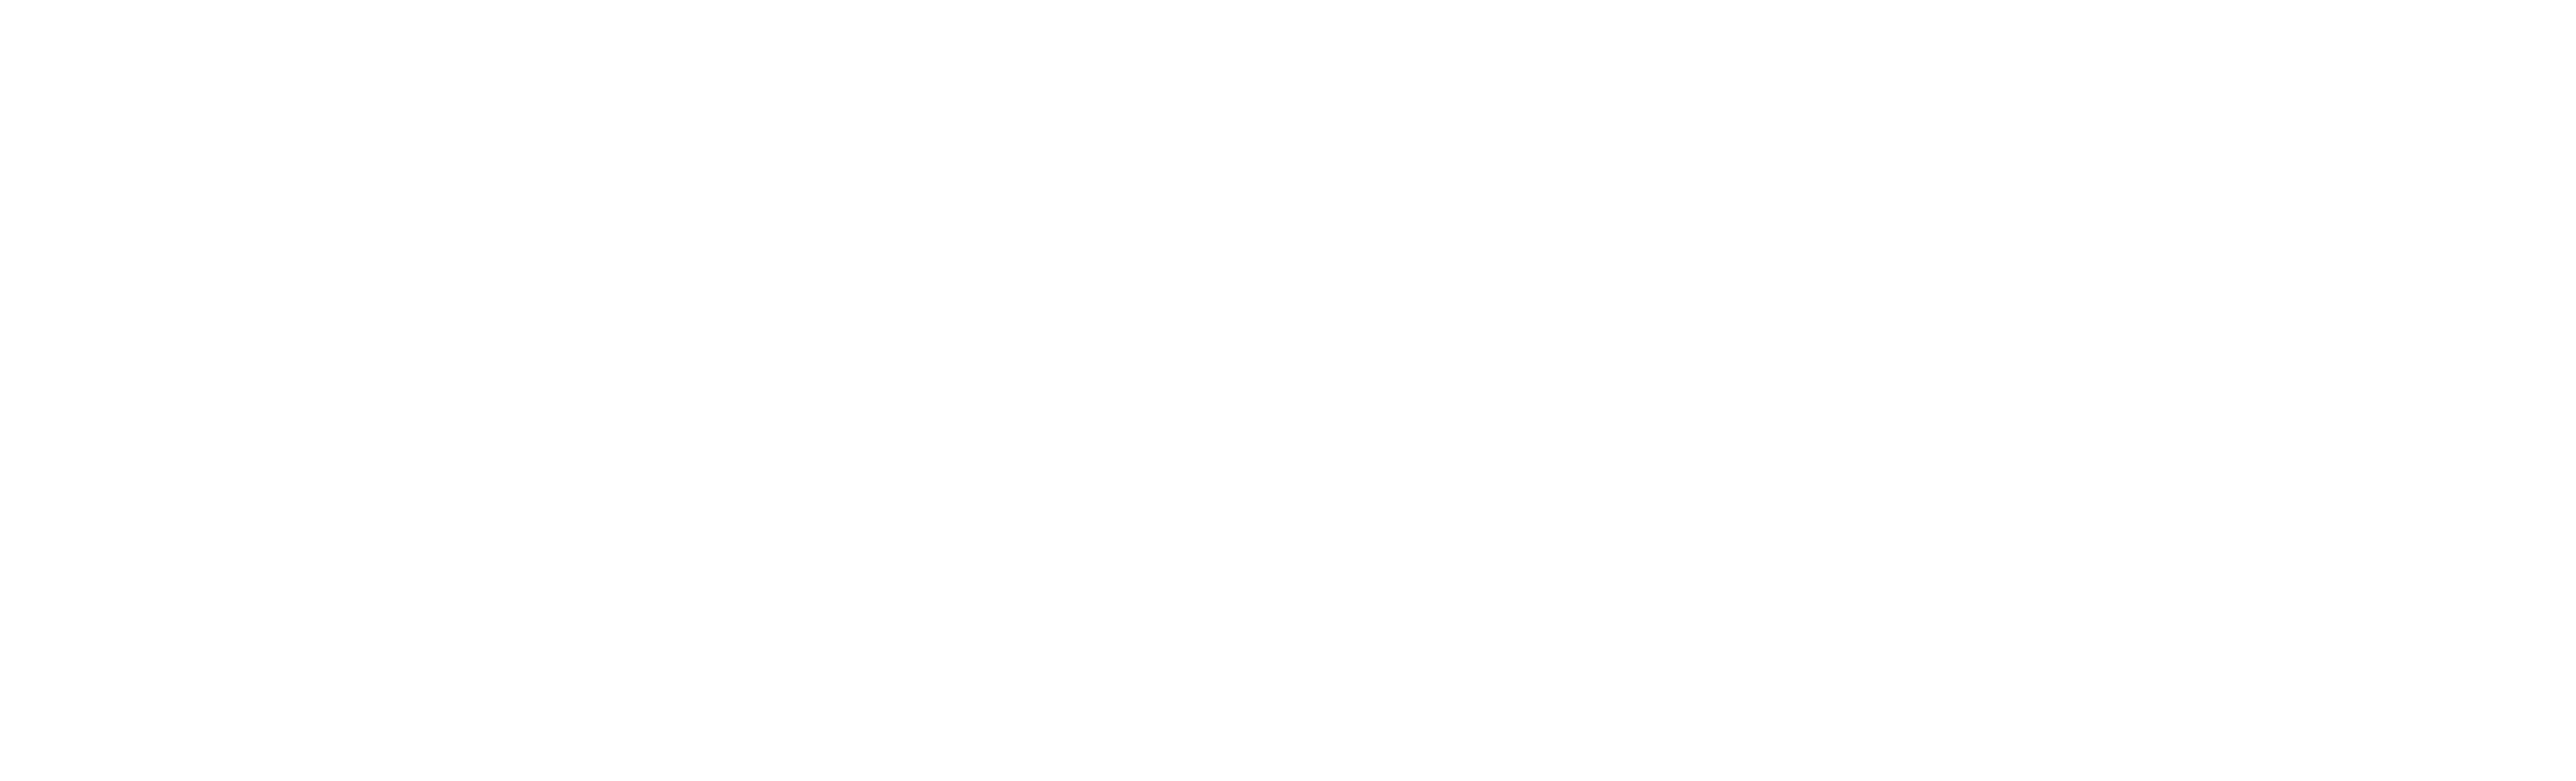 Basply header logo